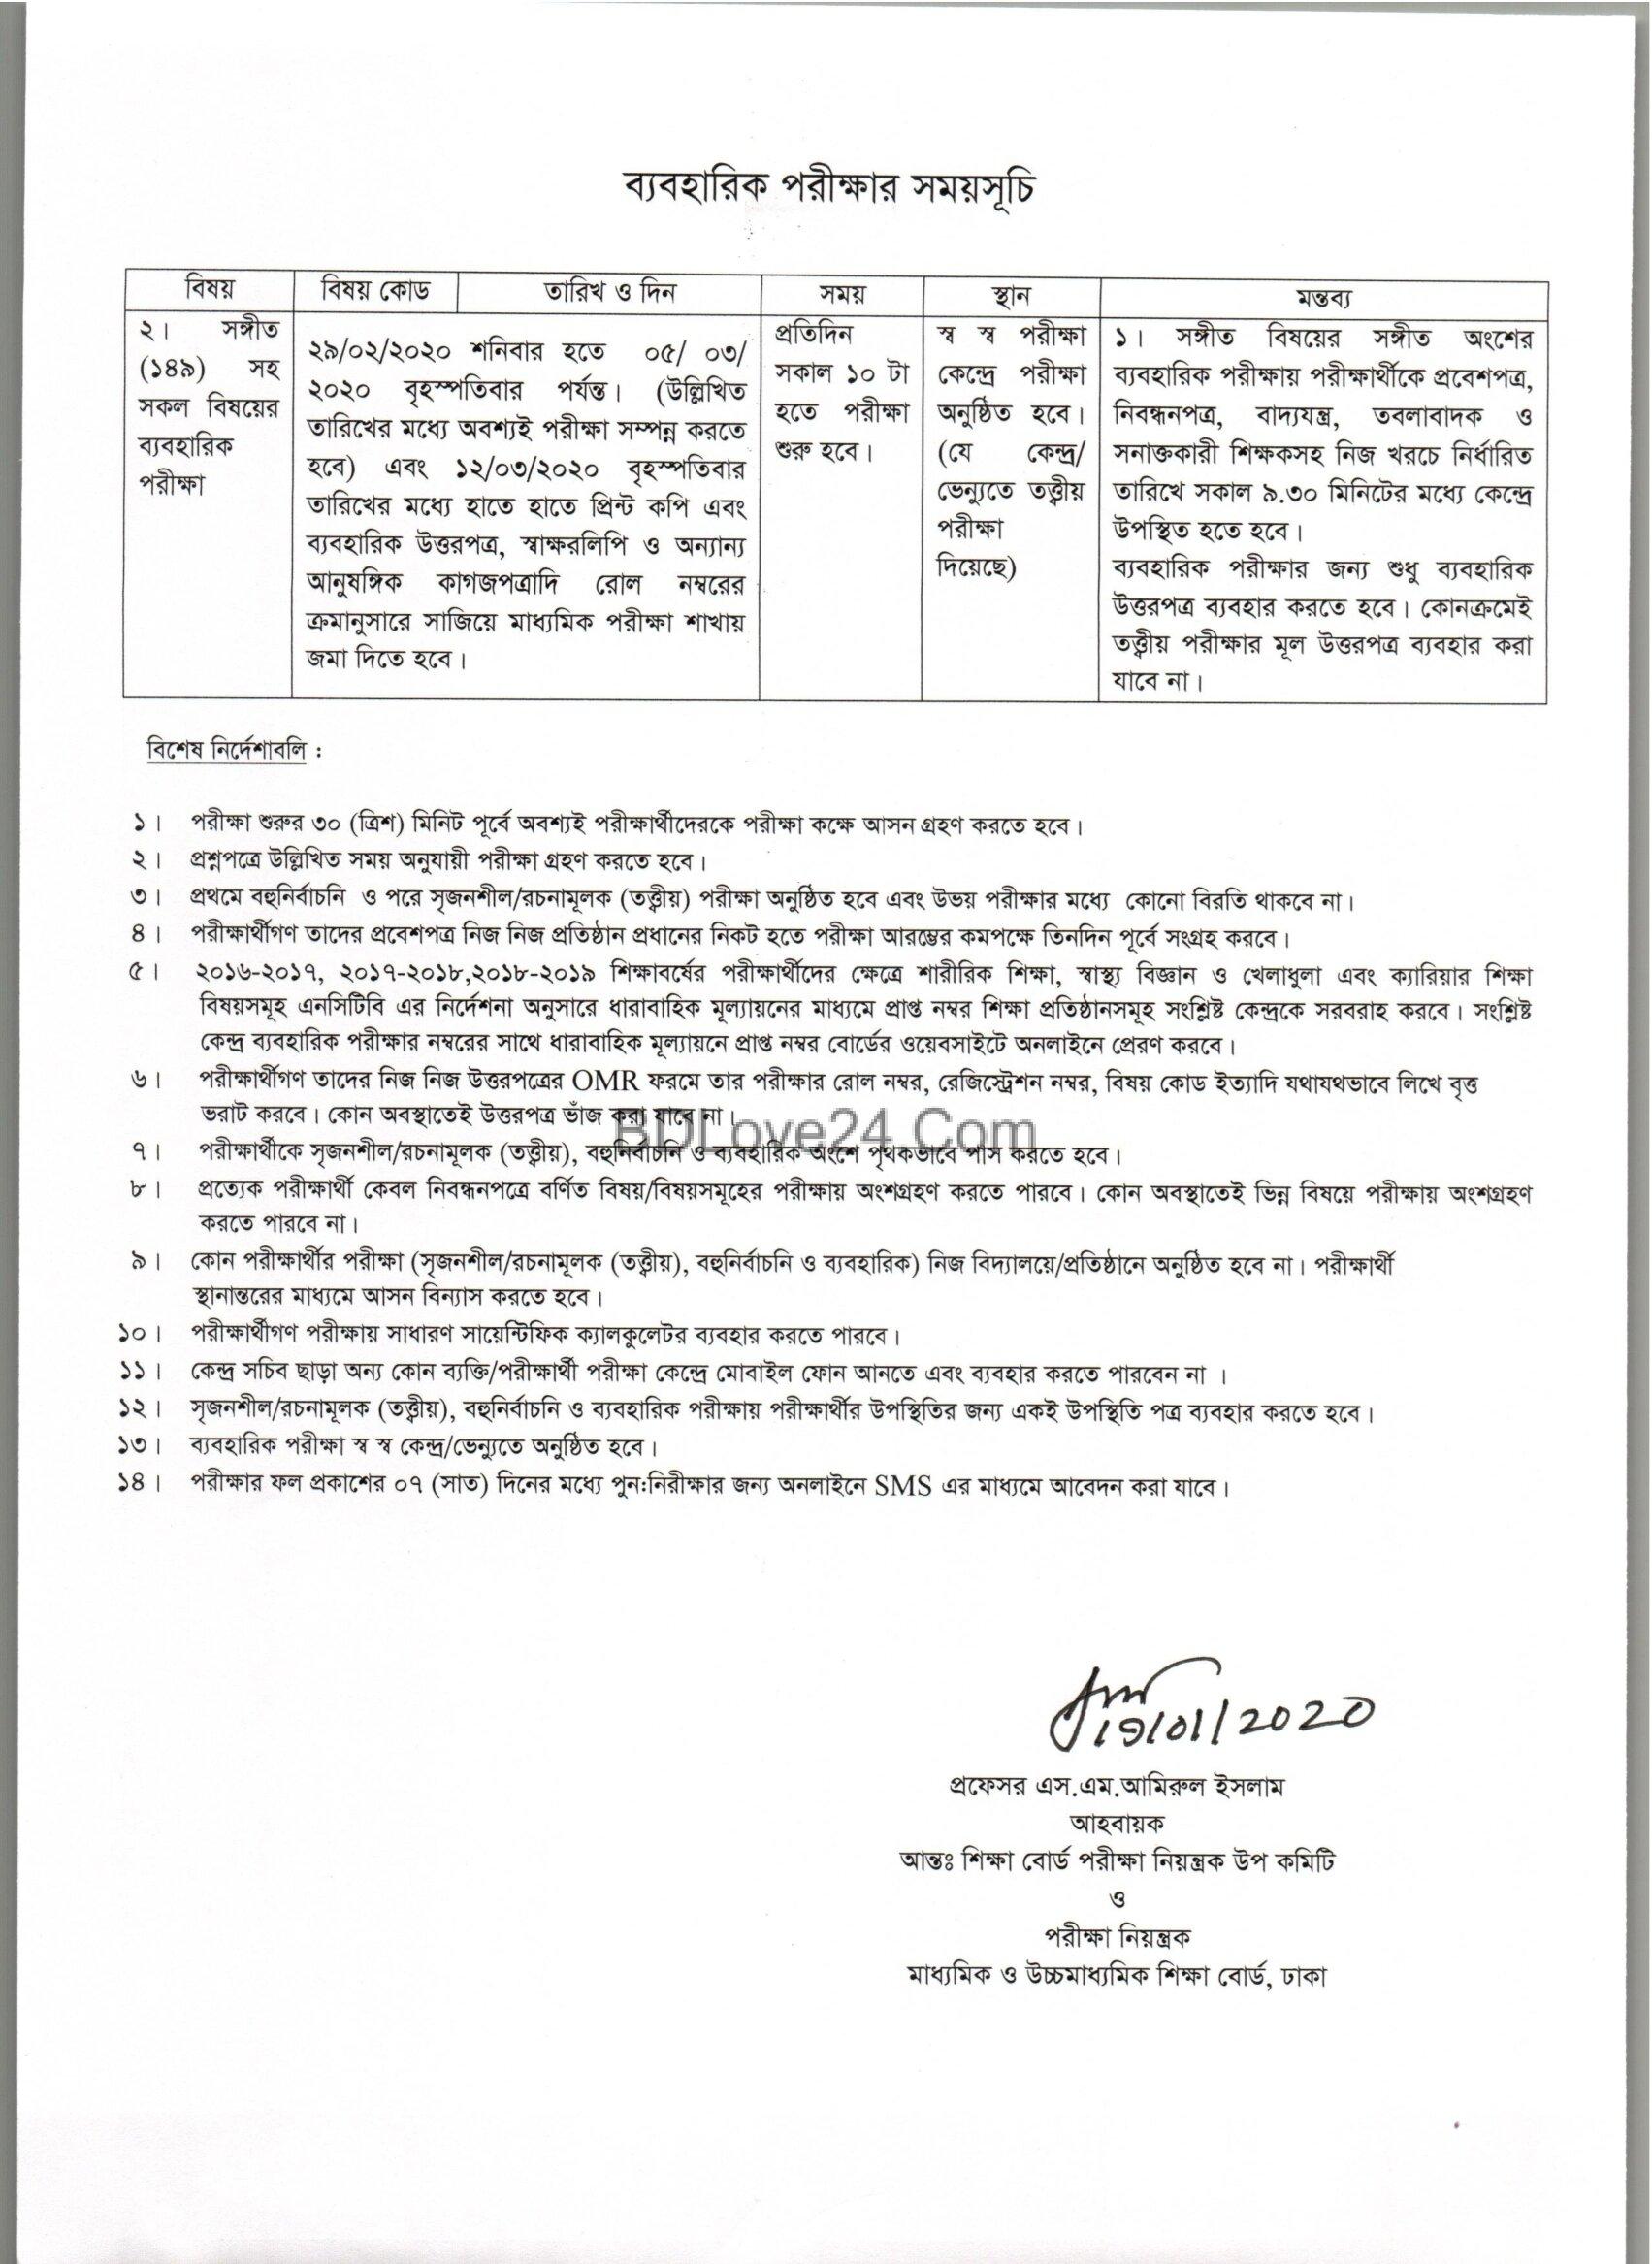 ssc rutine new 2020 0002 - SSC Exam Routine 2020 (new),Dakhil Exam Time Table 2020,SSC and Dakhil (New Routine)